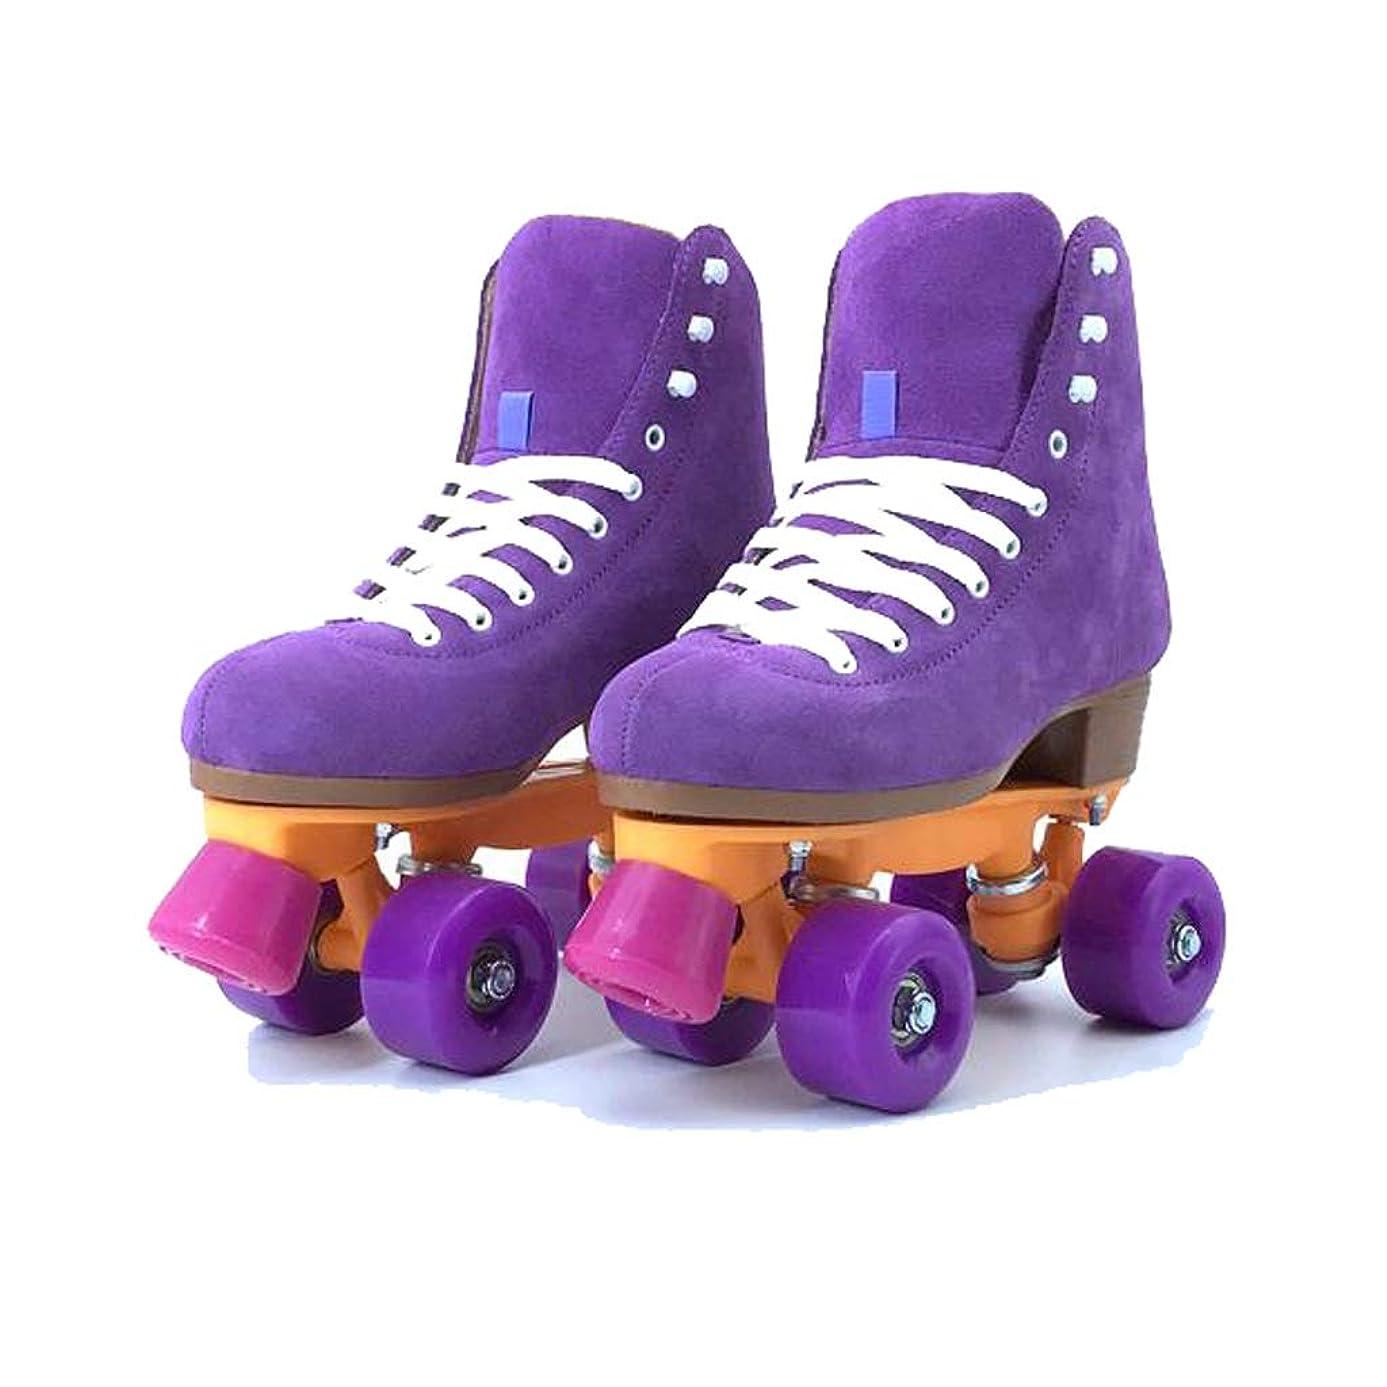 Ailj Adult Double Row Skates, Classic High-top Four-Wheeled Roller Skates Retro Fashion Children's Beginners Roller Skates Purple